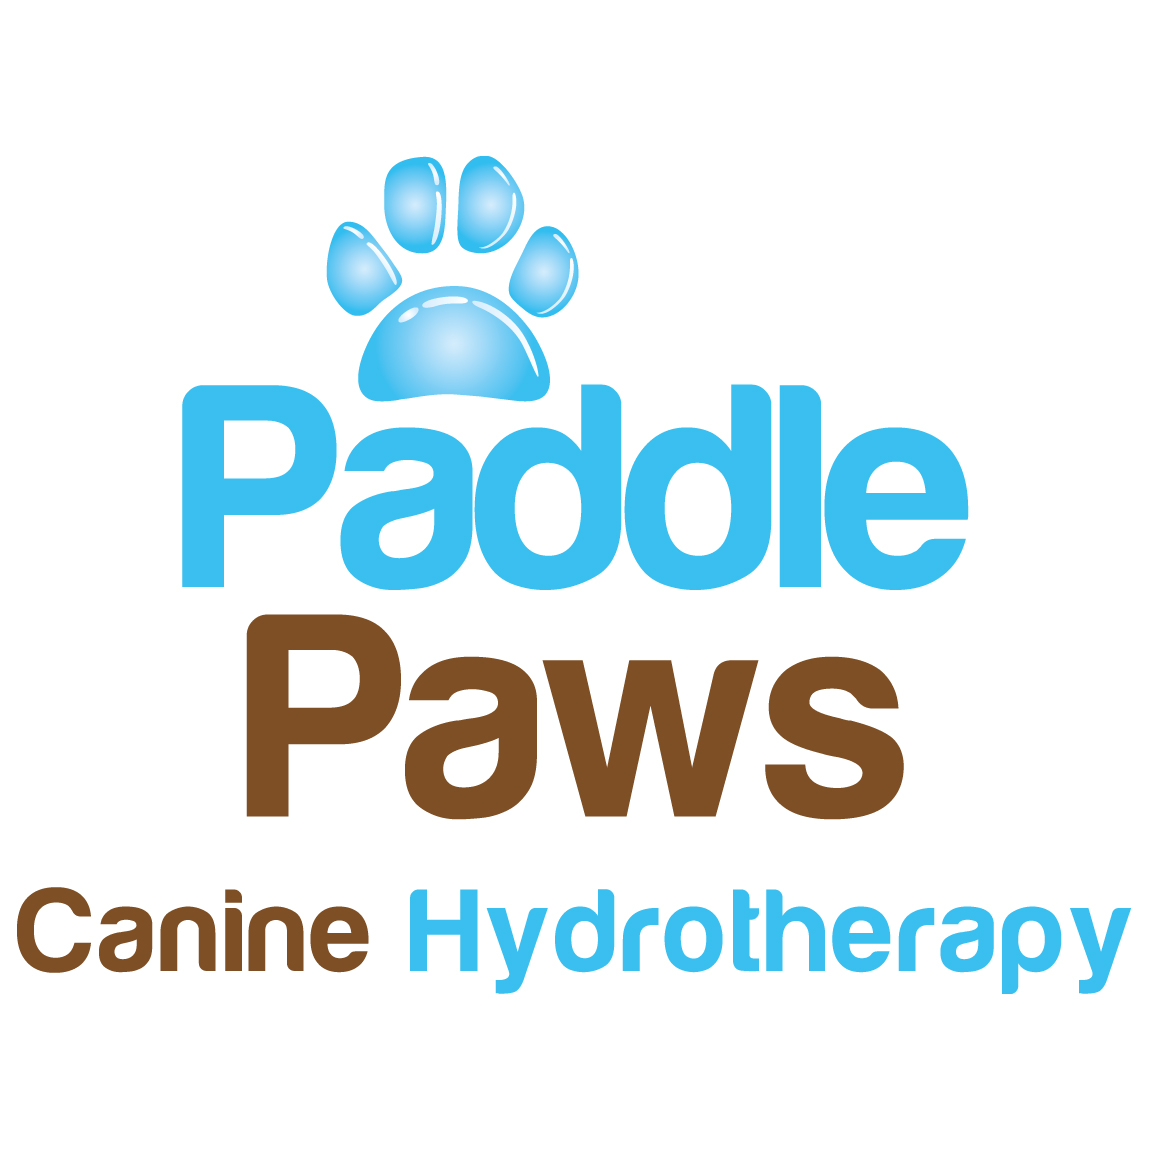 Paddle Paws logo